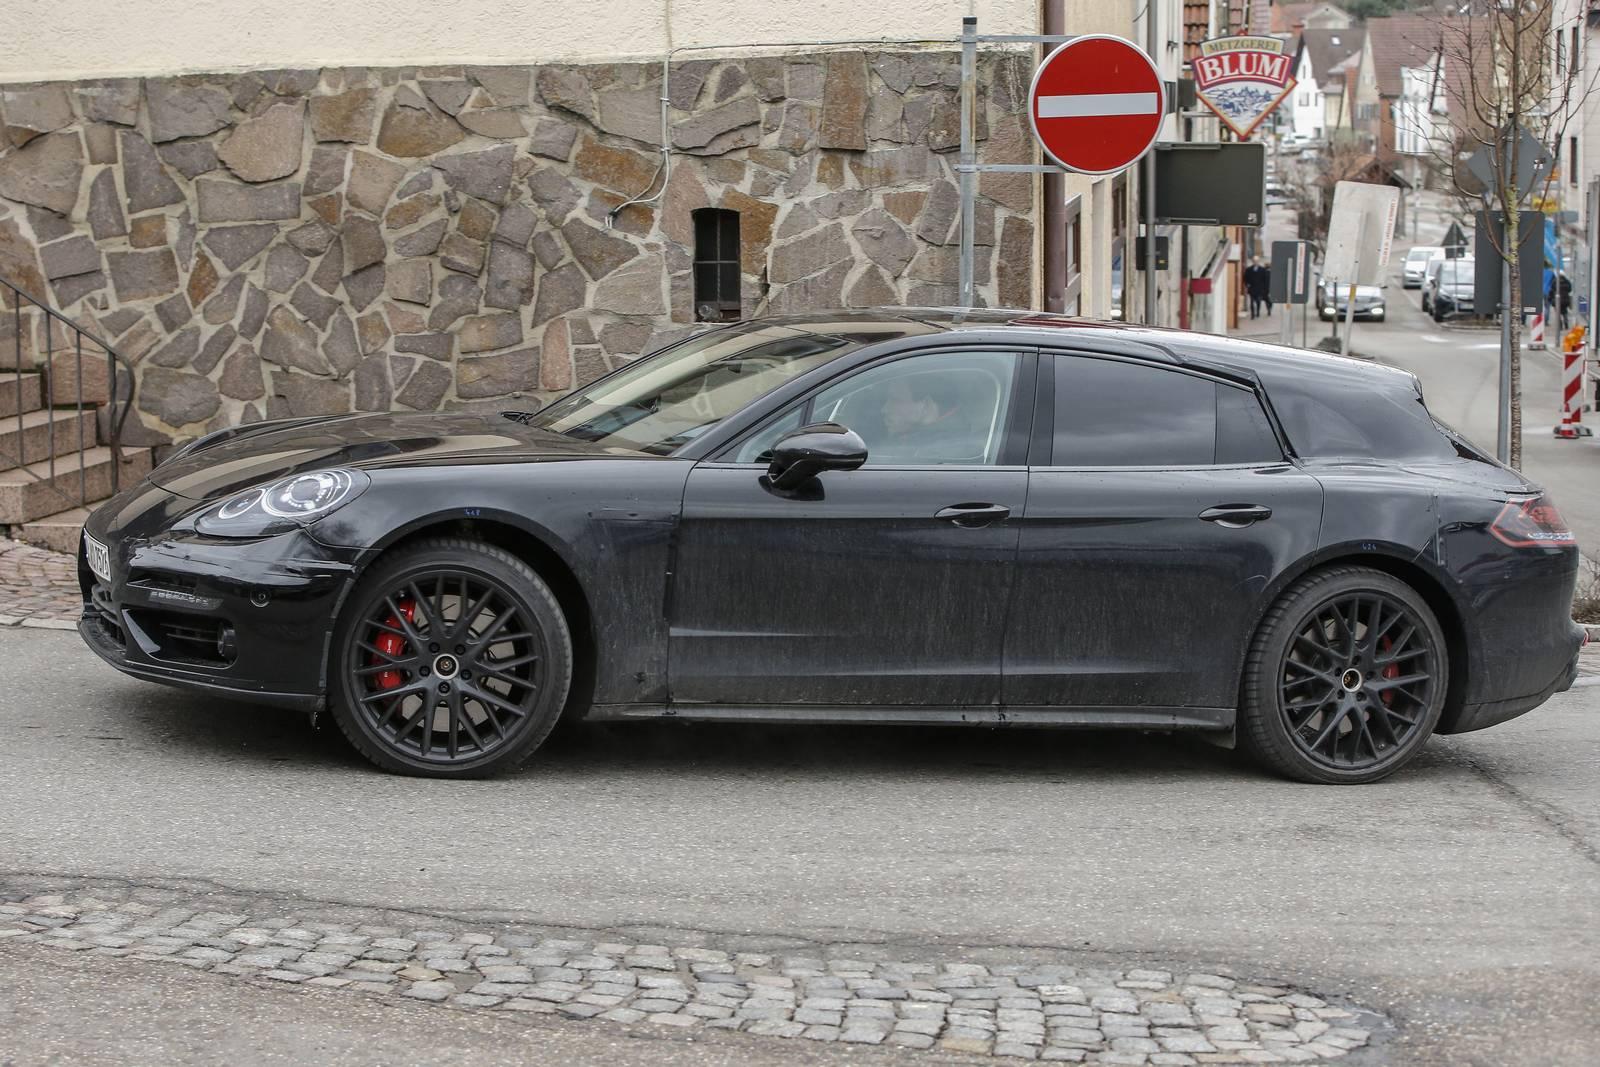 2018 porsche panamera shooting brake latest spy shots gtspirit - Porsche Panamera Shooting Brake Spy Shots 1 Of 10 Tags Porsche Panamera